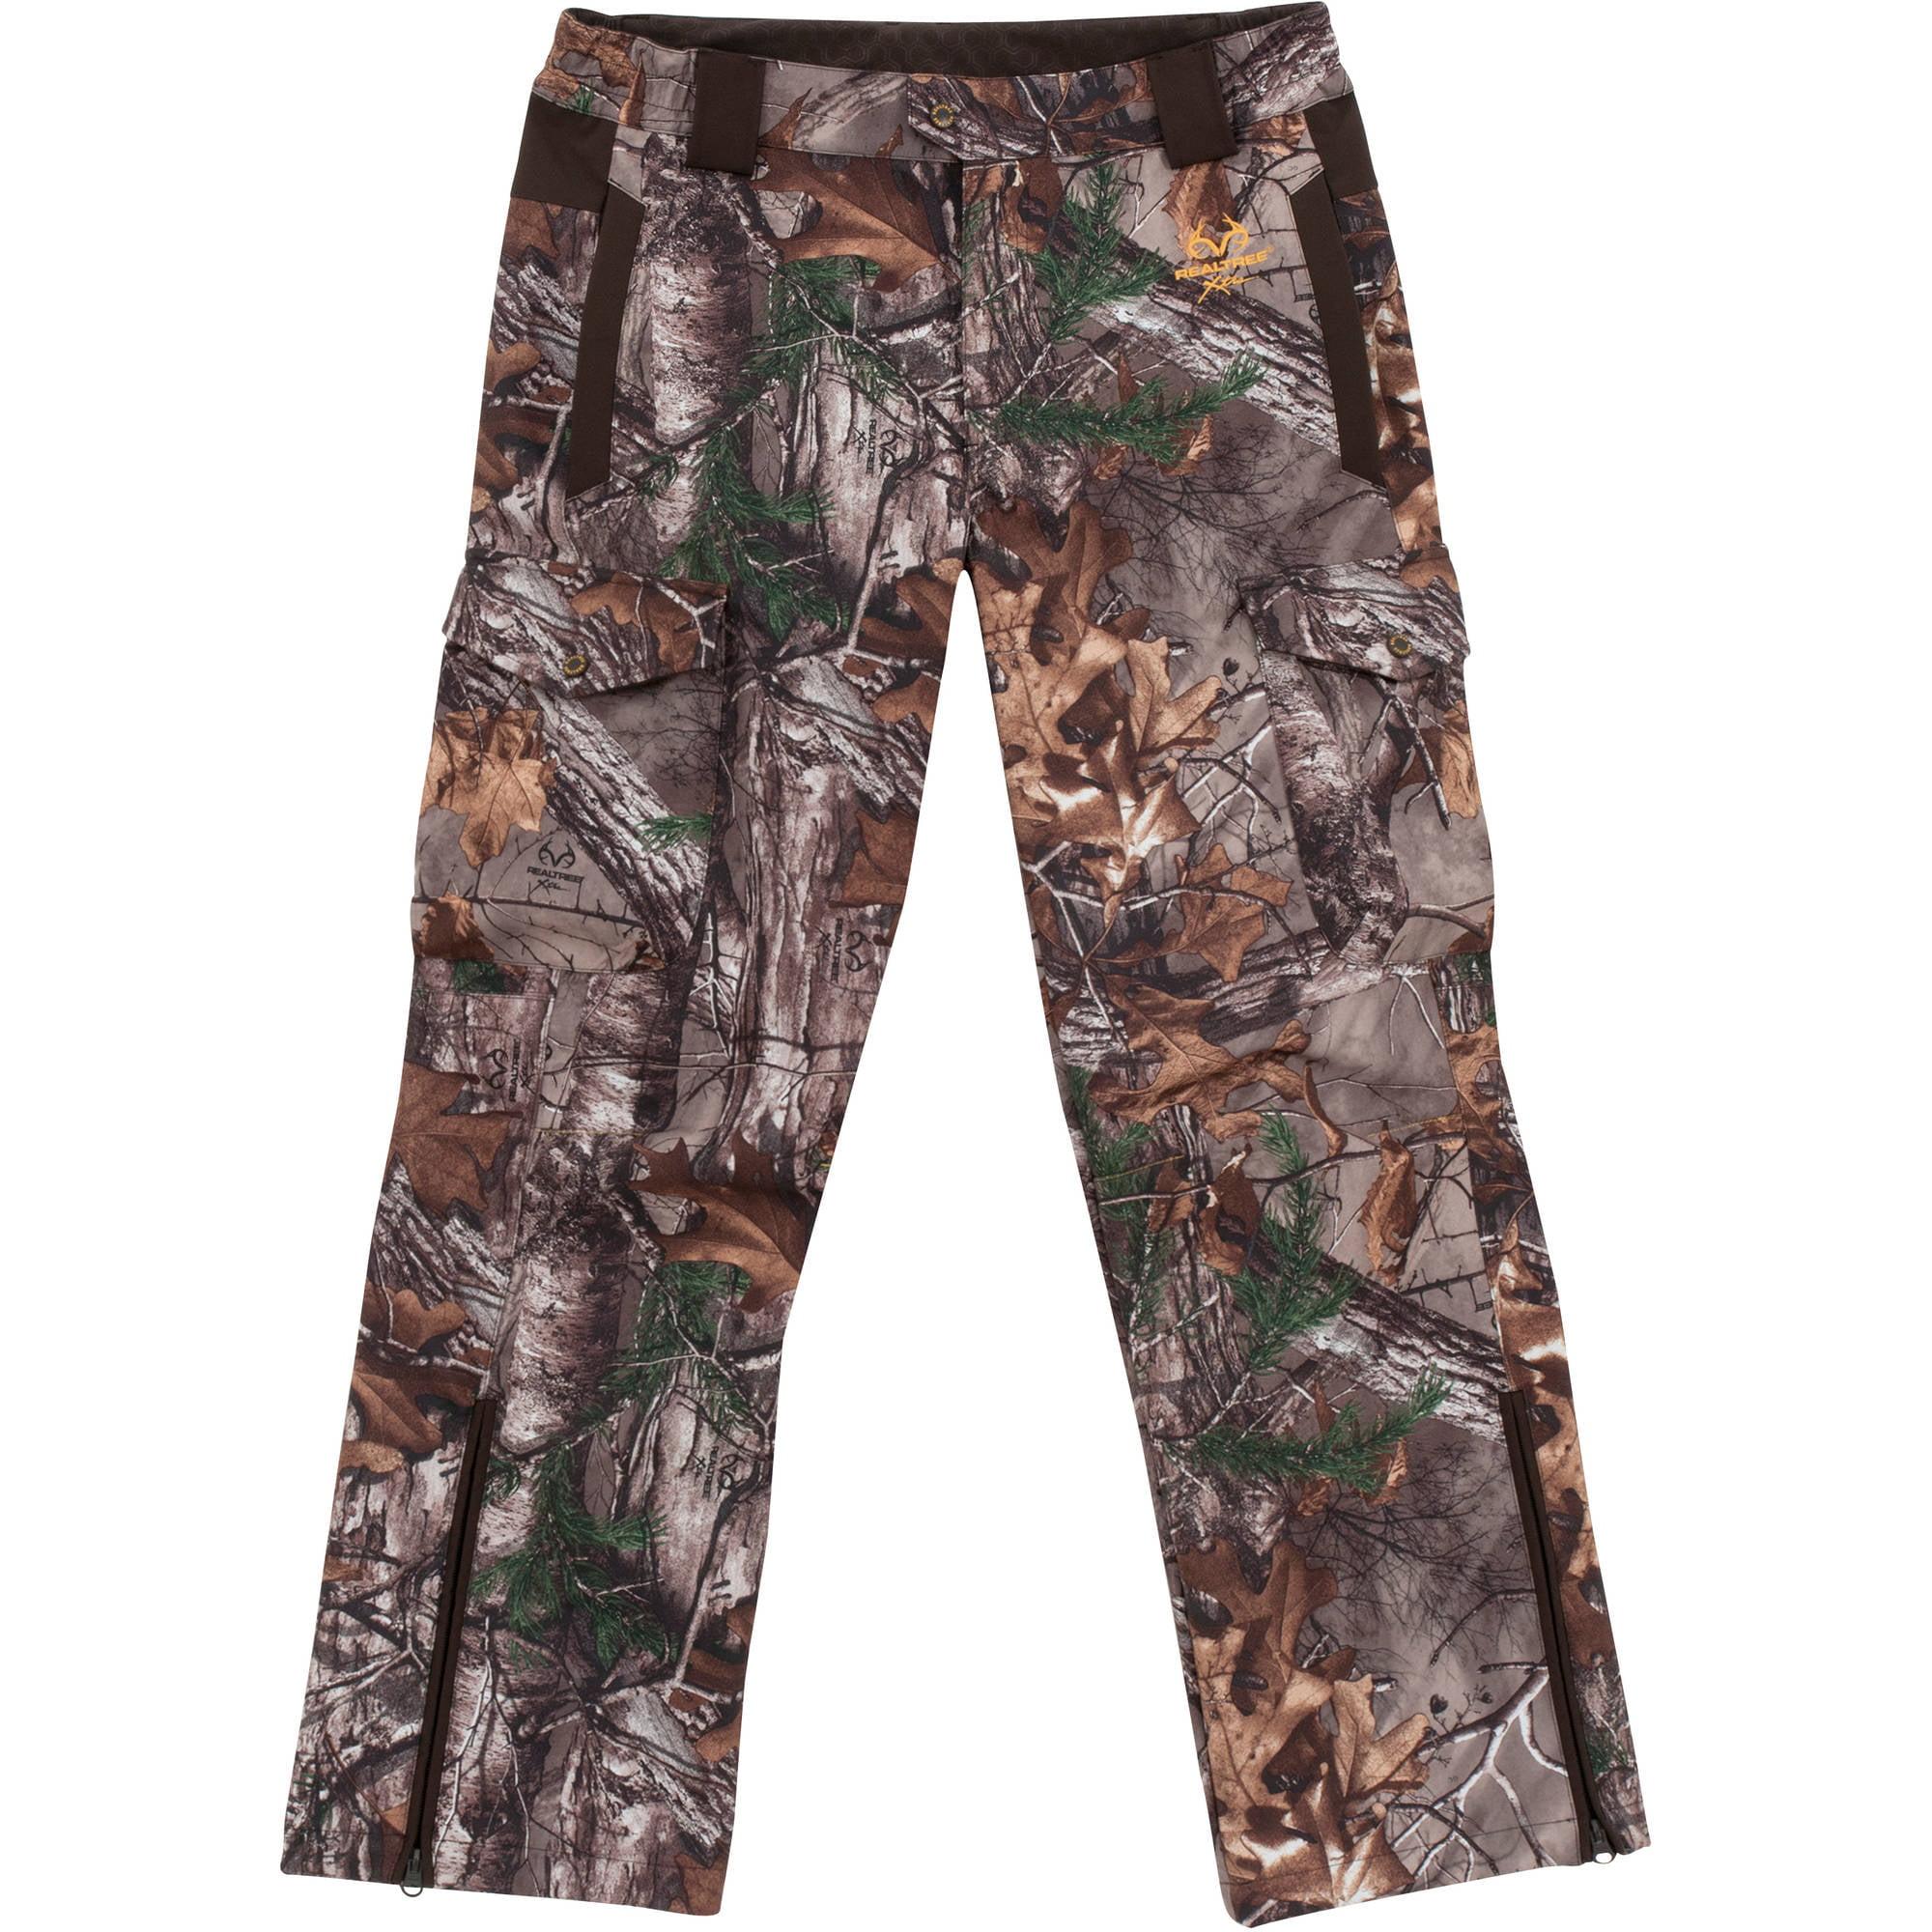 Realtree Men's Soft Shell Pant